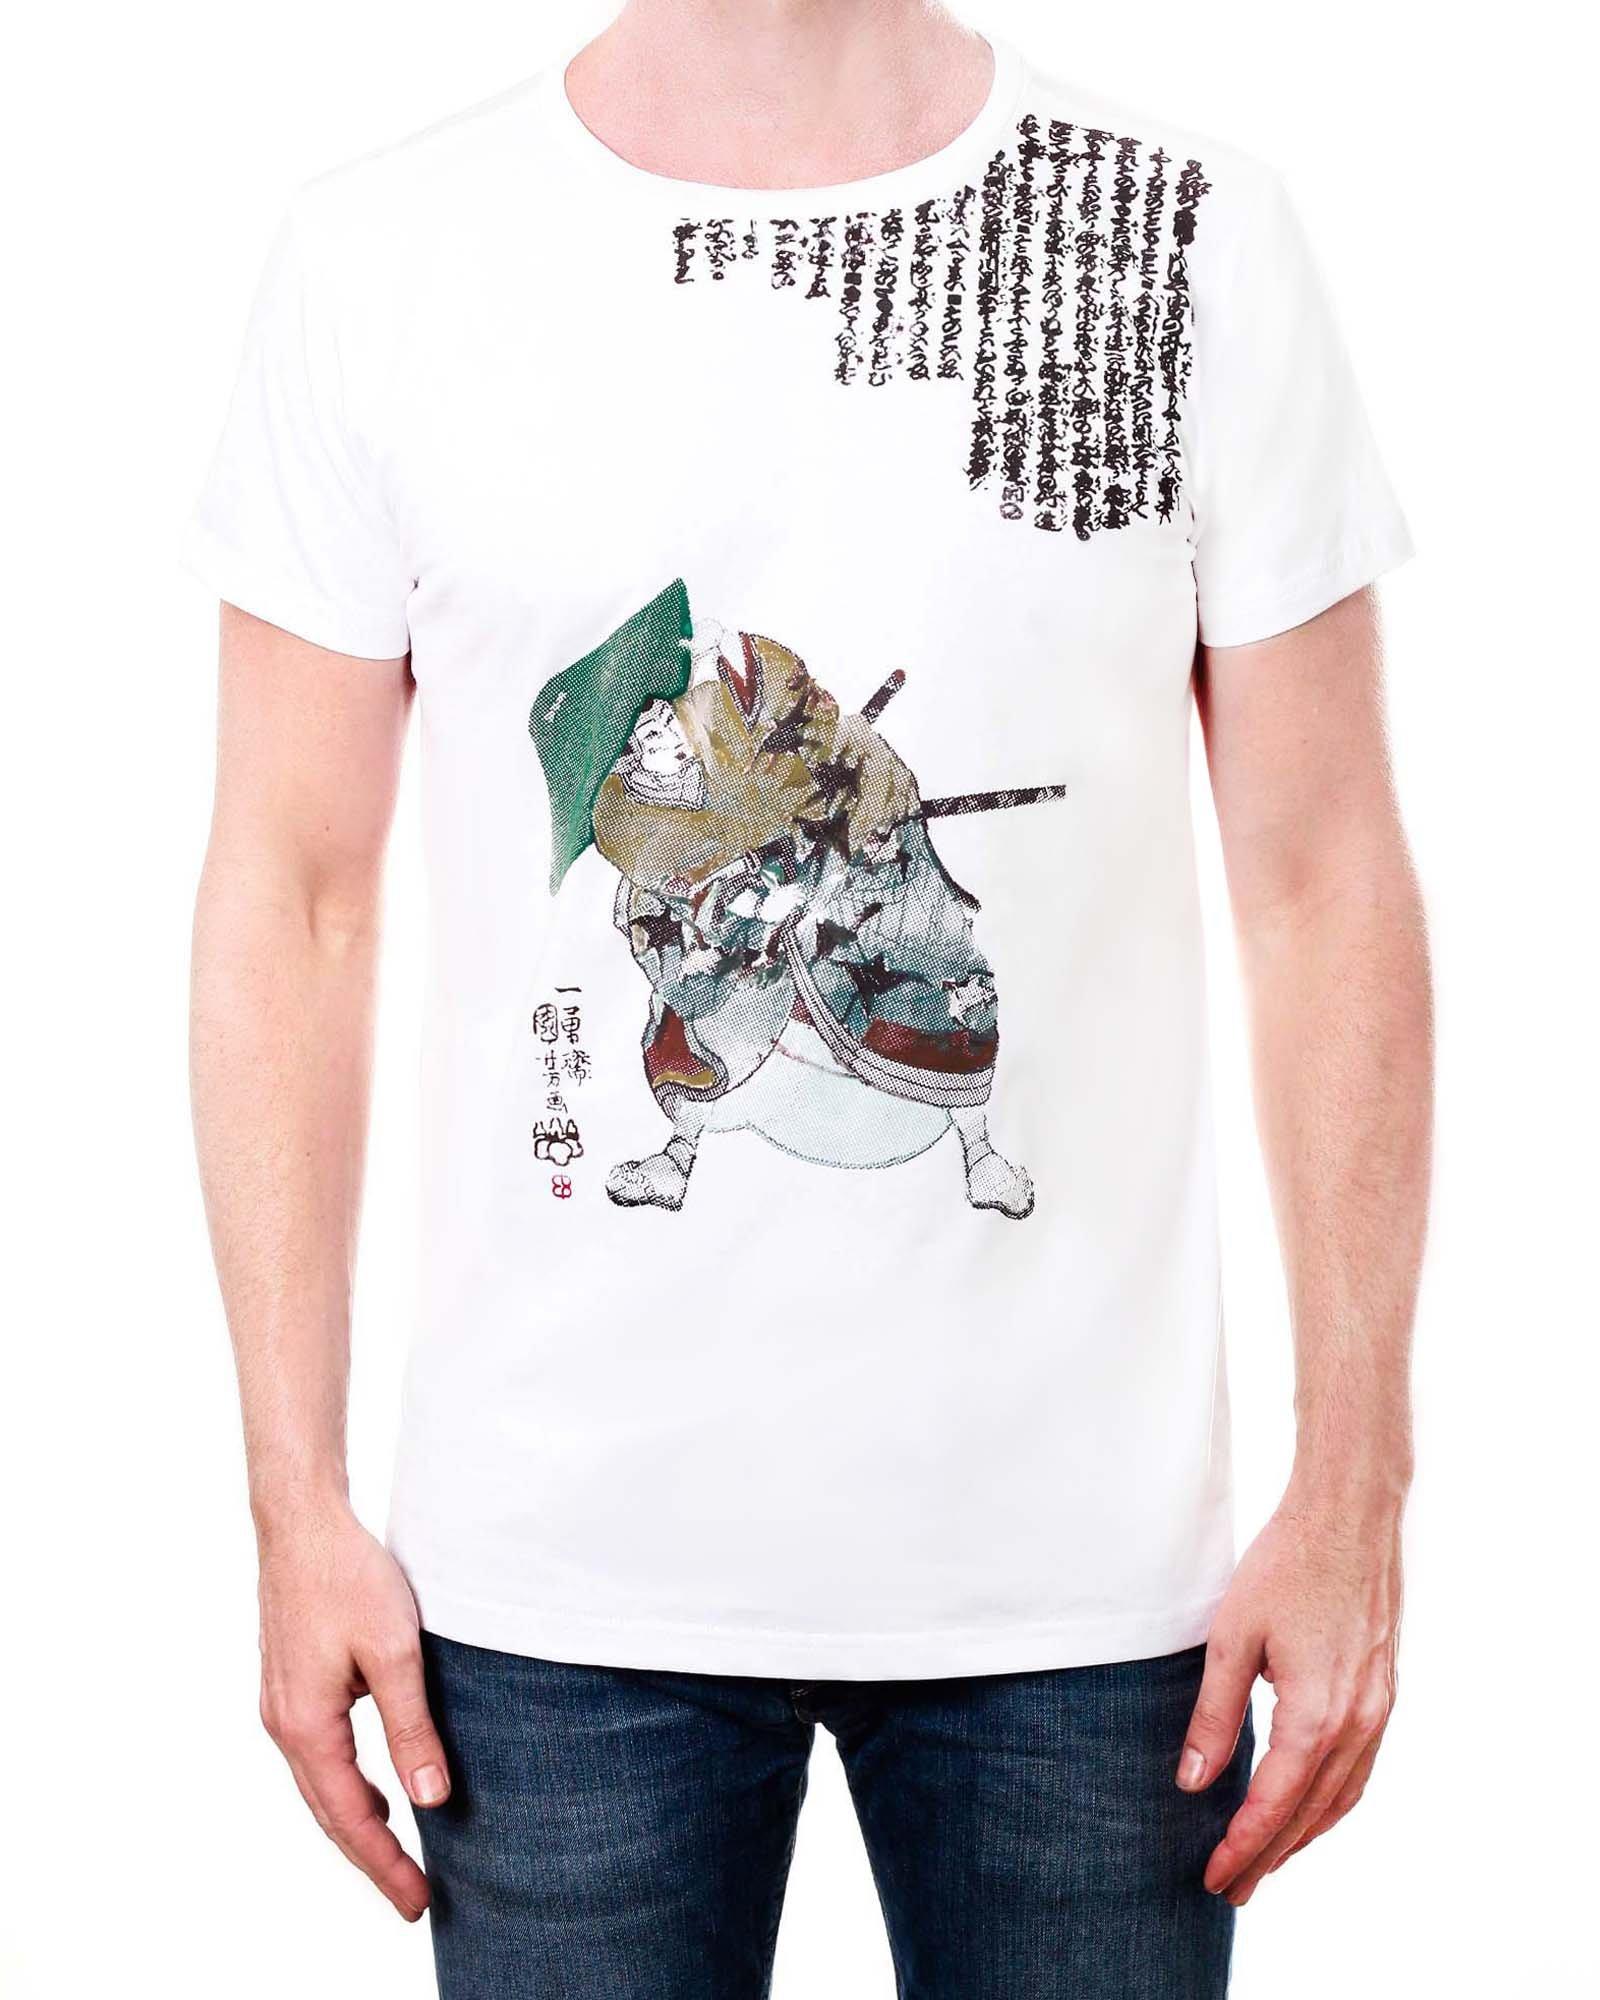 EBCC_EB002WH_Men_s_White_T-Shirt_Round_Collar_Samurai_Print_1c_a8411049-0322-439d-8124-cdcfeb174c8d_1024x1024@2x